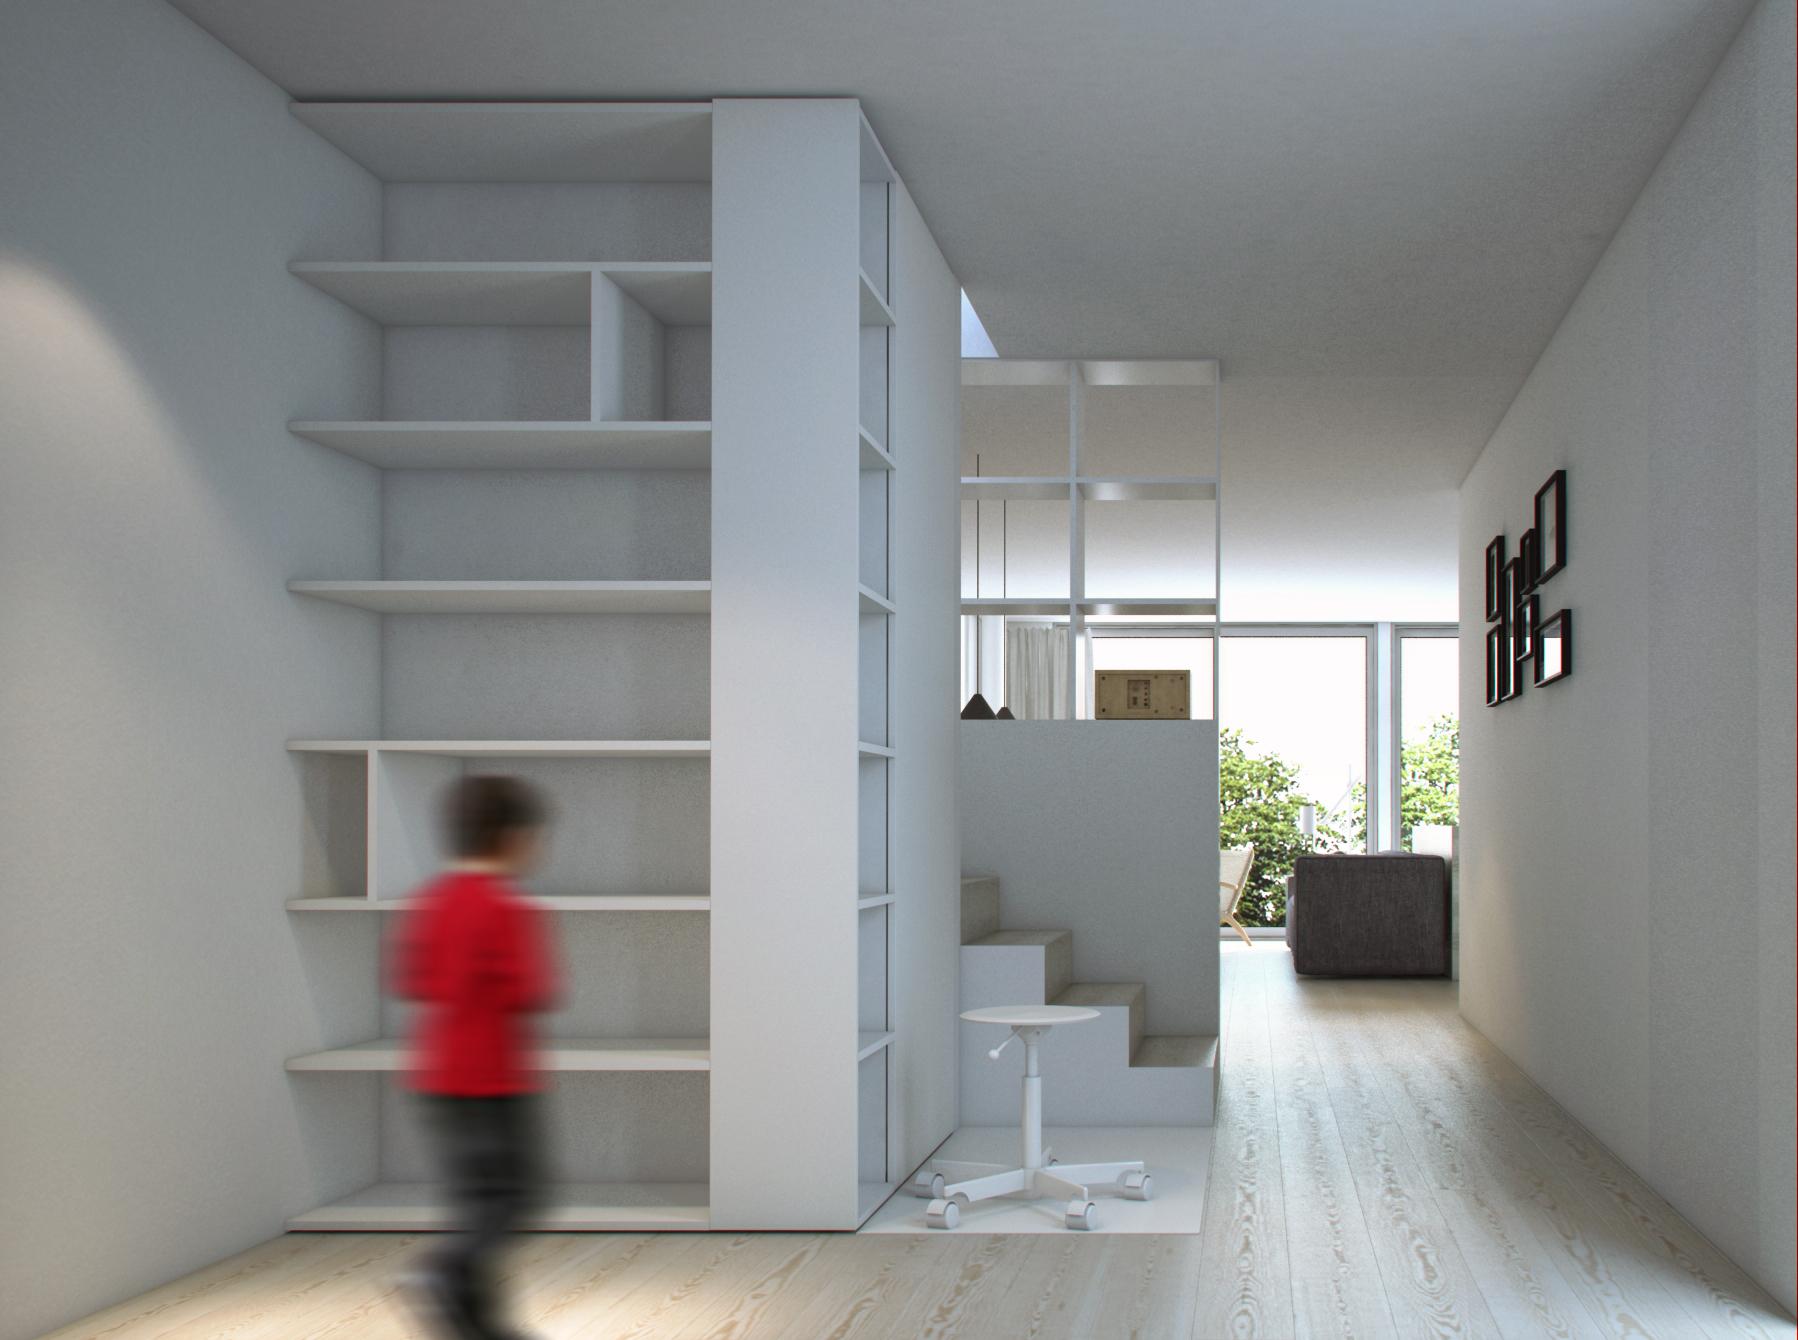 planell-hirsch_arquitectura_interiorismo_rehabilitacion_barcelona_arenys 03